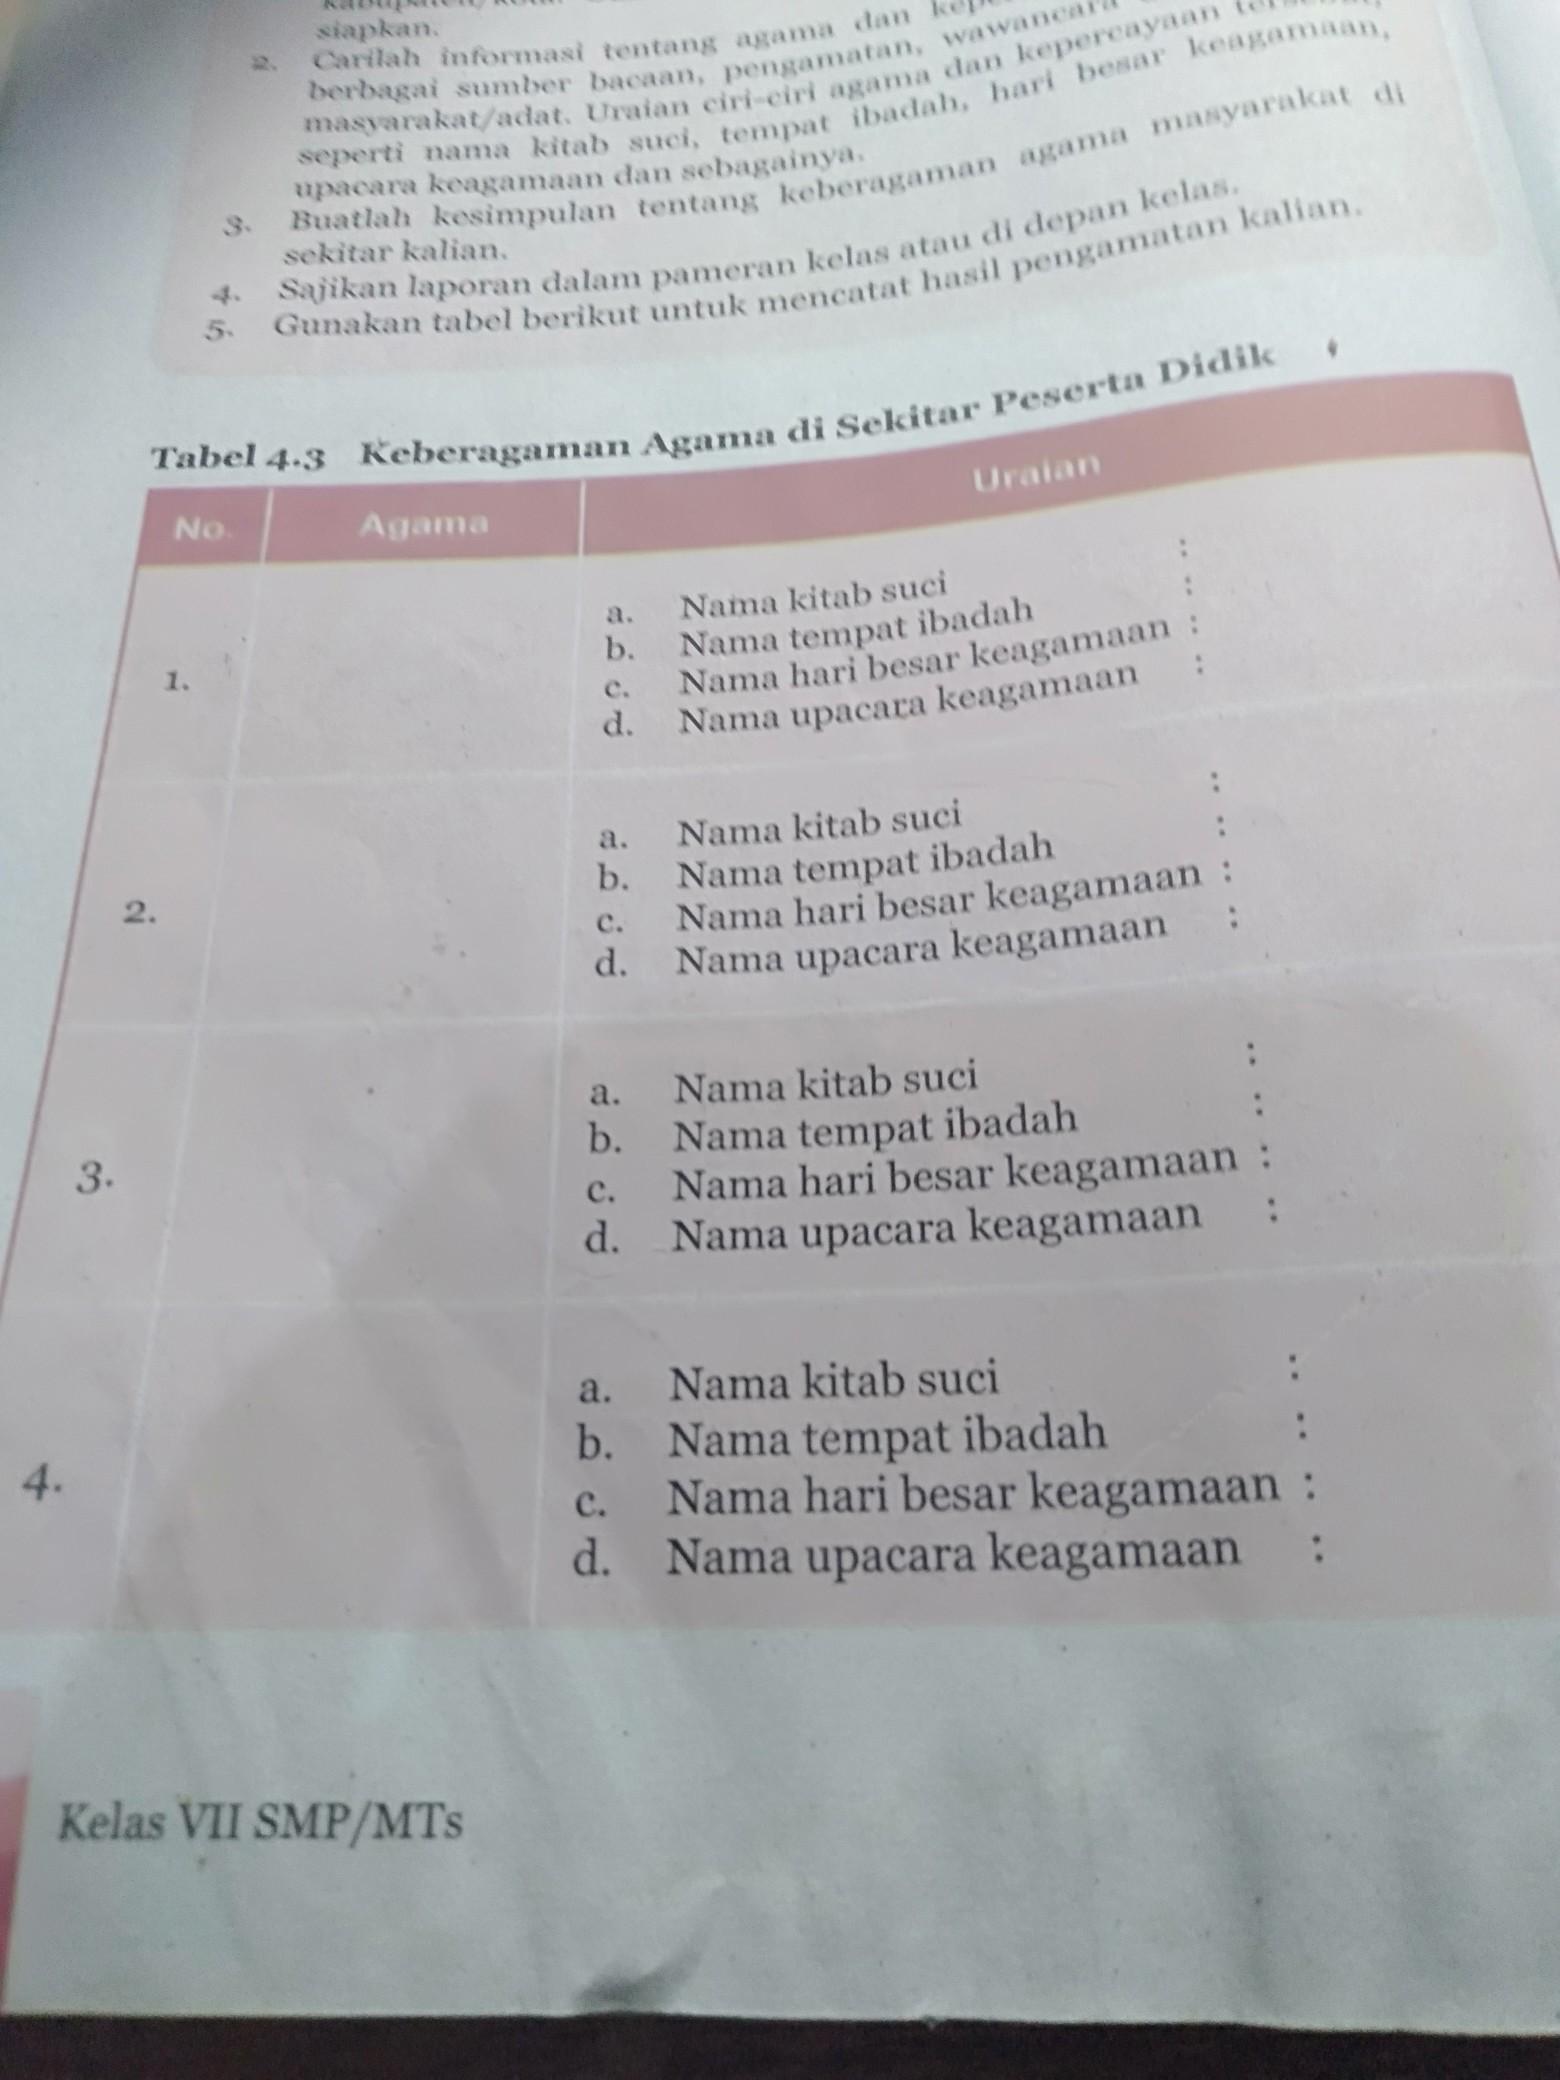 Nama Upacara Keagamaan Konghucu : upacara, keagamaan, konghucu, Upacara, Keagamaan, Agama, Indonesia, IlmuSosial.id